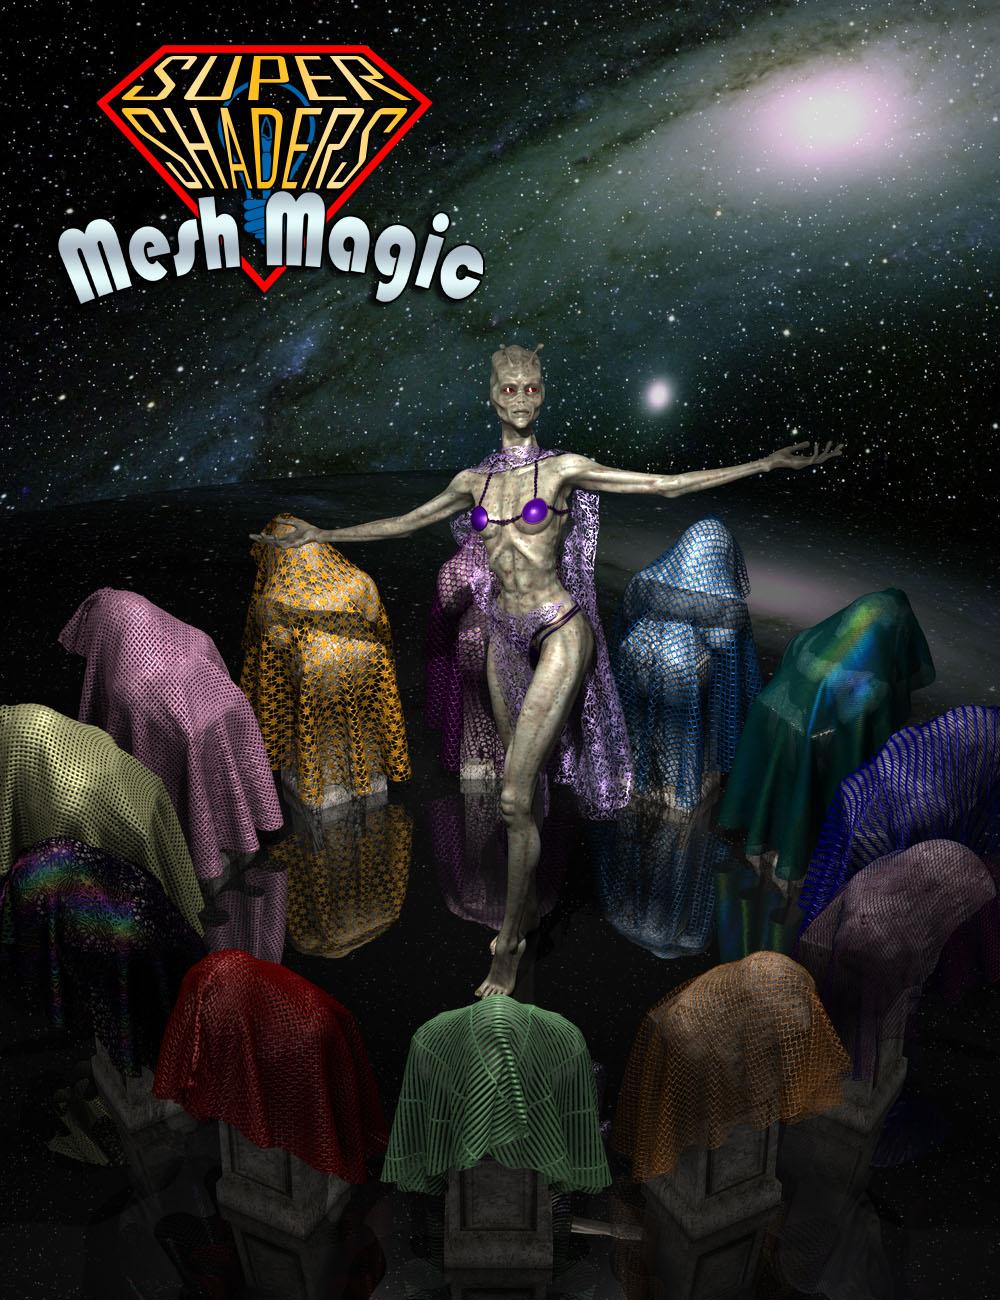 Super Shaders - Mesh Magic by: Denki Gaka, 3D Models by Daz 3D